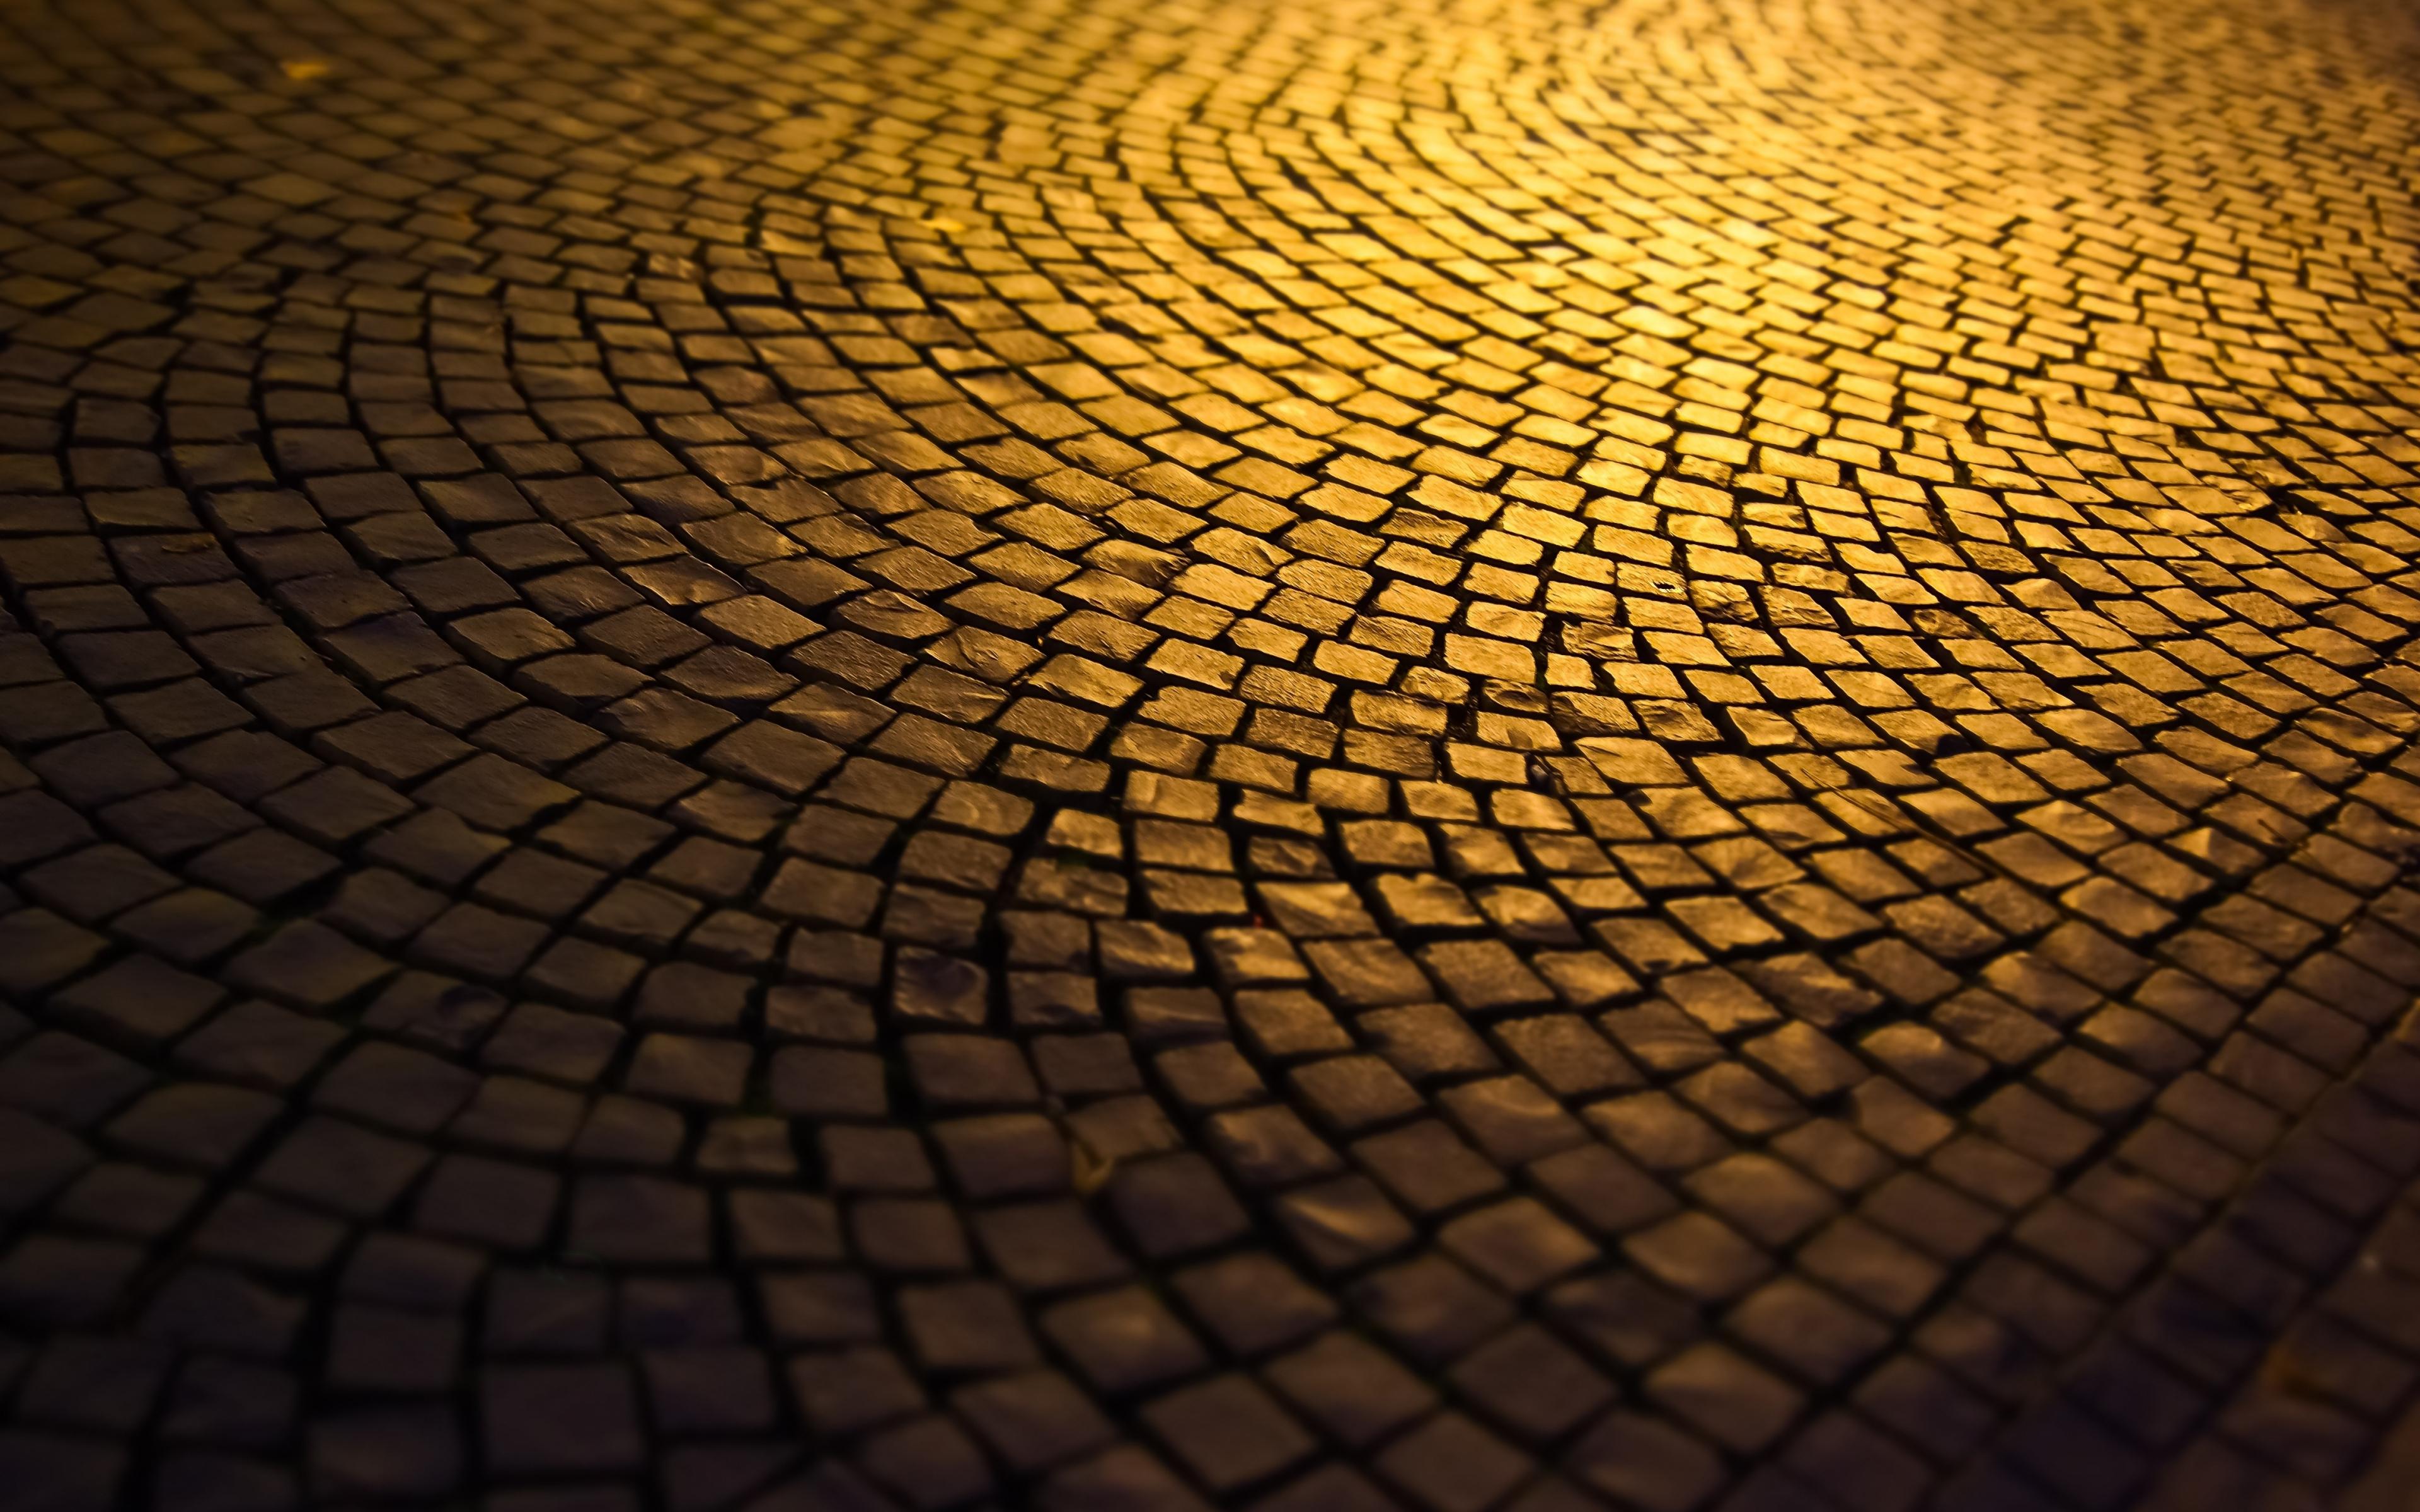 Download 3840x2400 Wallpaper Texture Pattern Street Carpet Road 4k Ultra Hd 16 10 Widescreen 3840x2400 Hd Image Background 17792